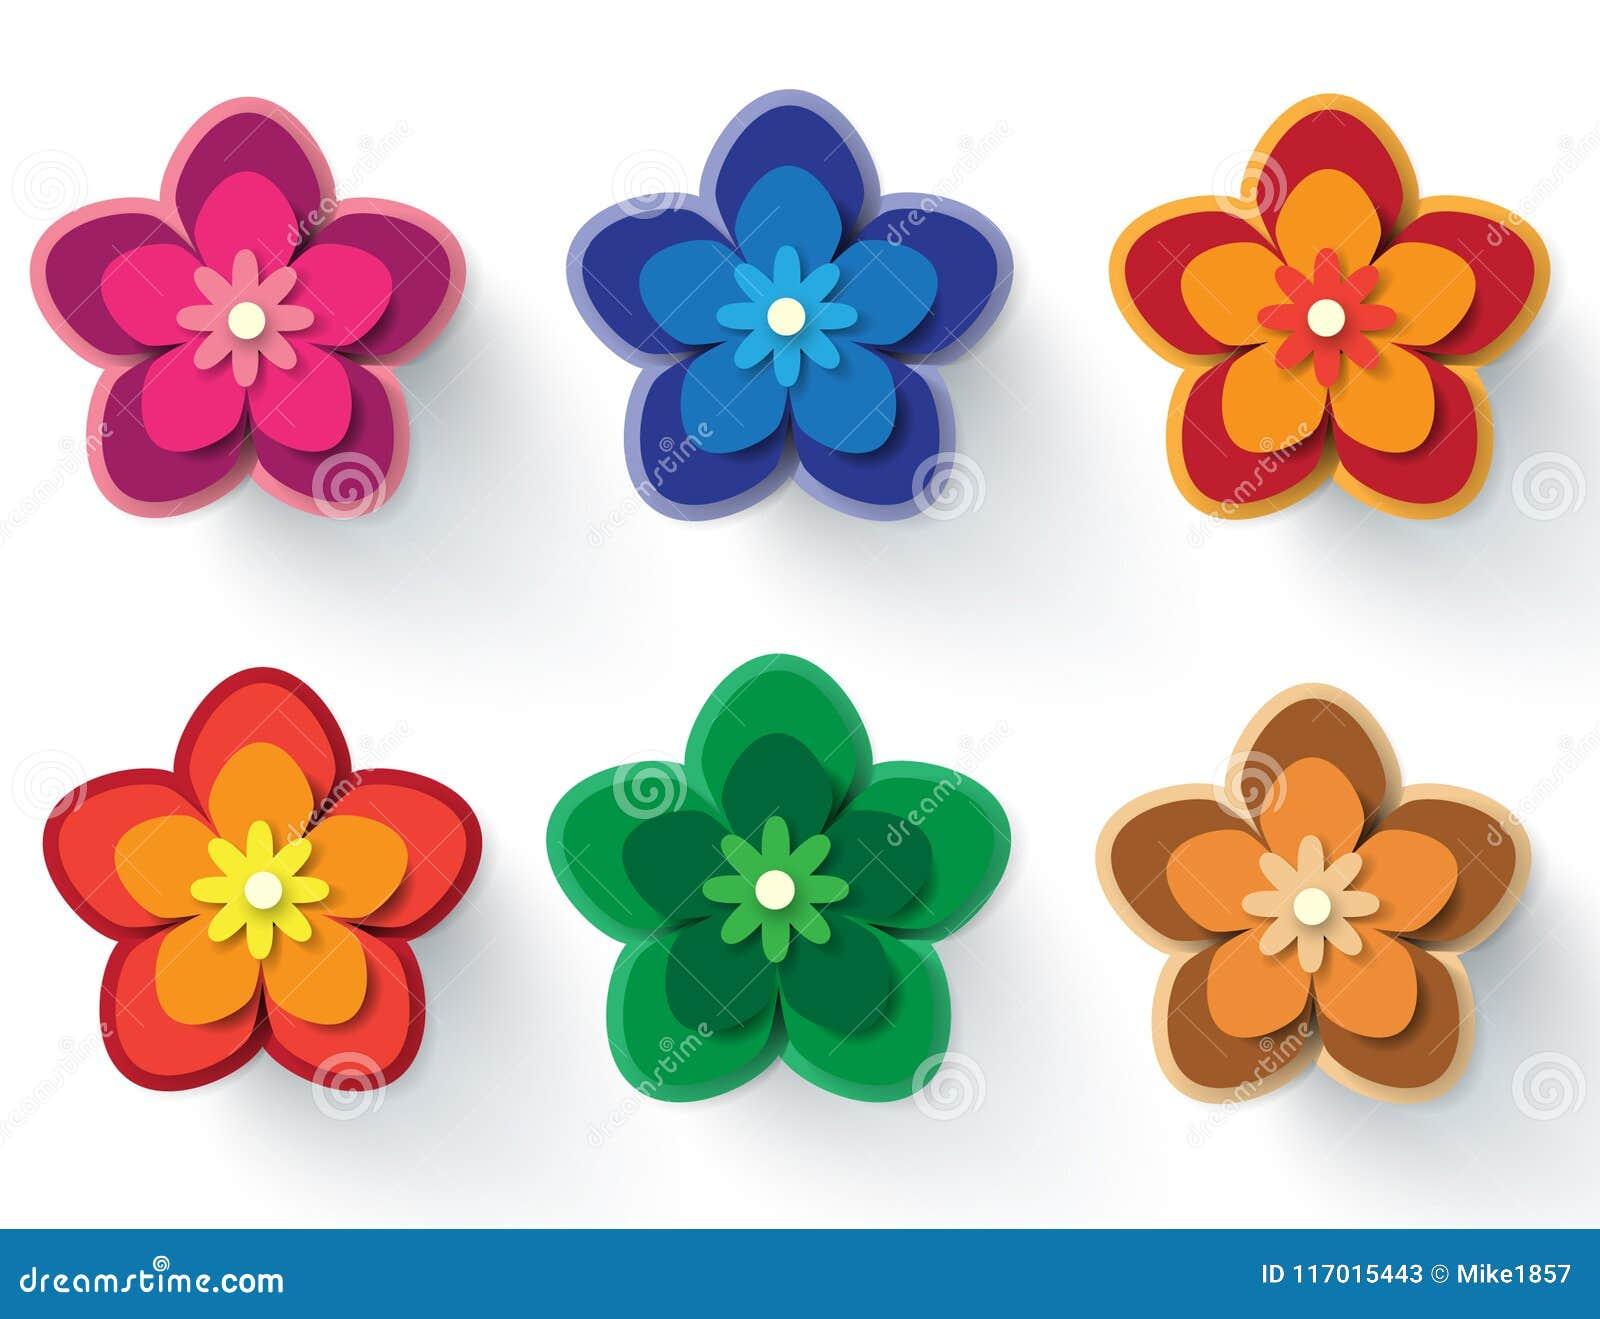 Paper Flowers Vector Elements Set Stock Vector Illustration Of